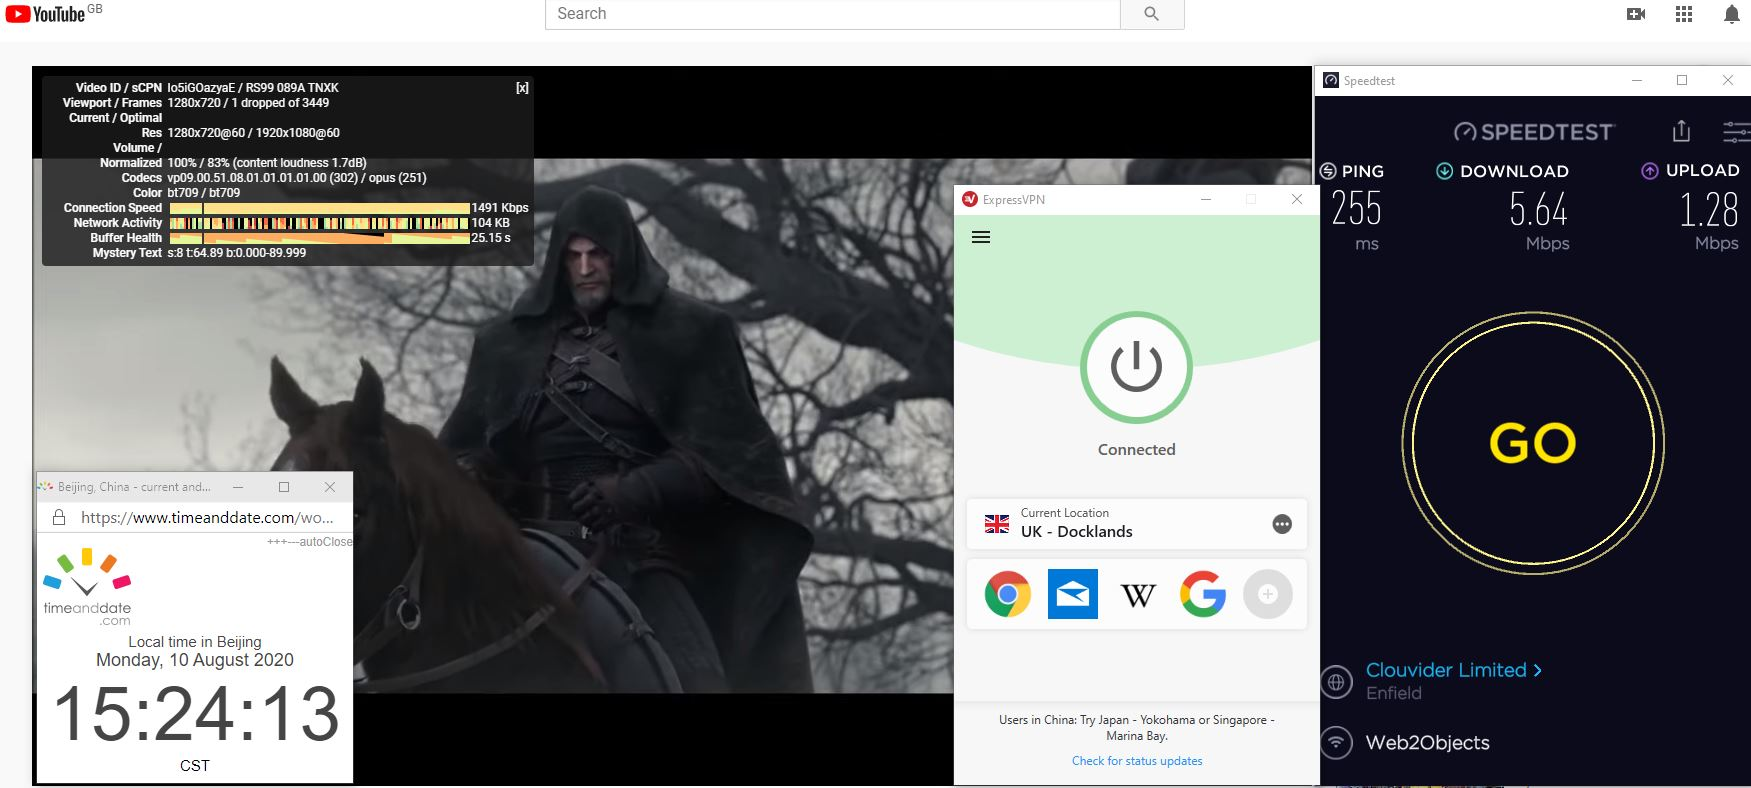 Windows10 ExpressVPN IKEv2协议 UK- Docklands 中国VPN 翻墙 科学上网 翻墙速度测试 - 20200810